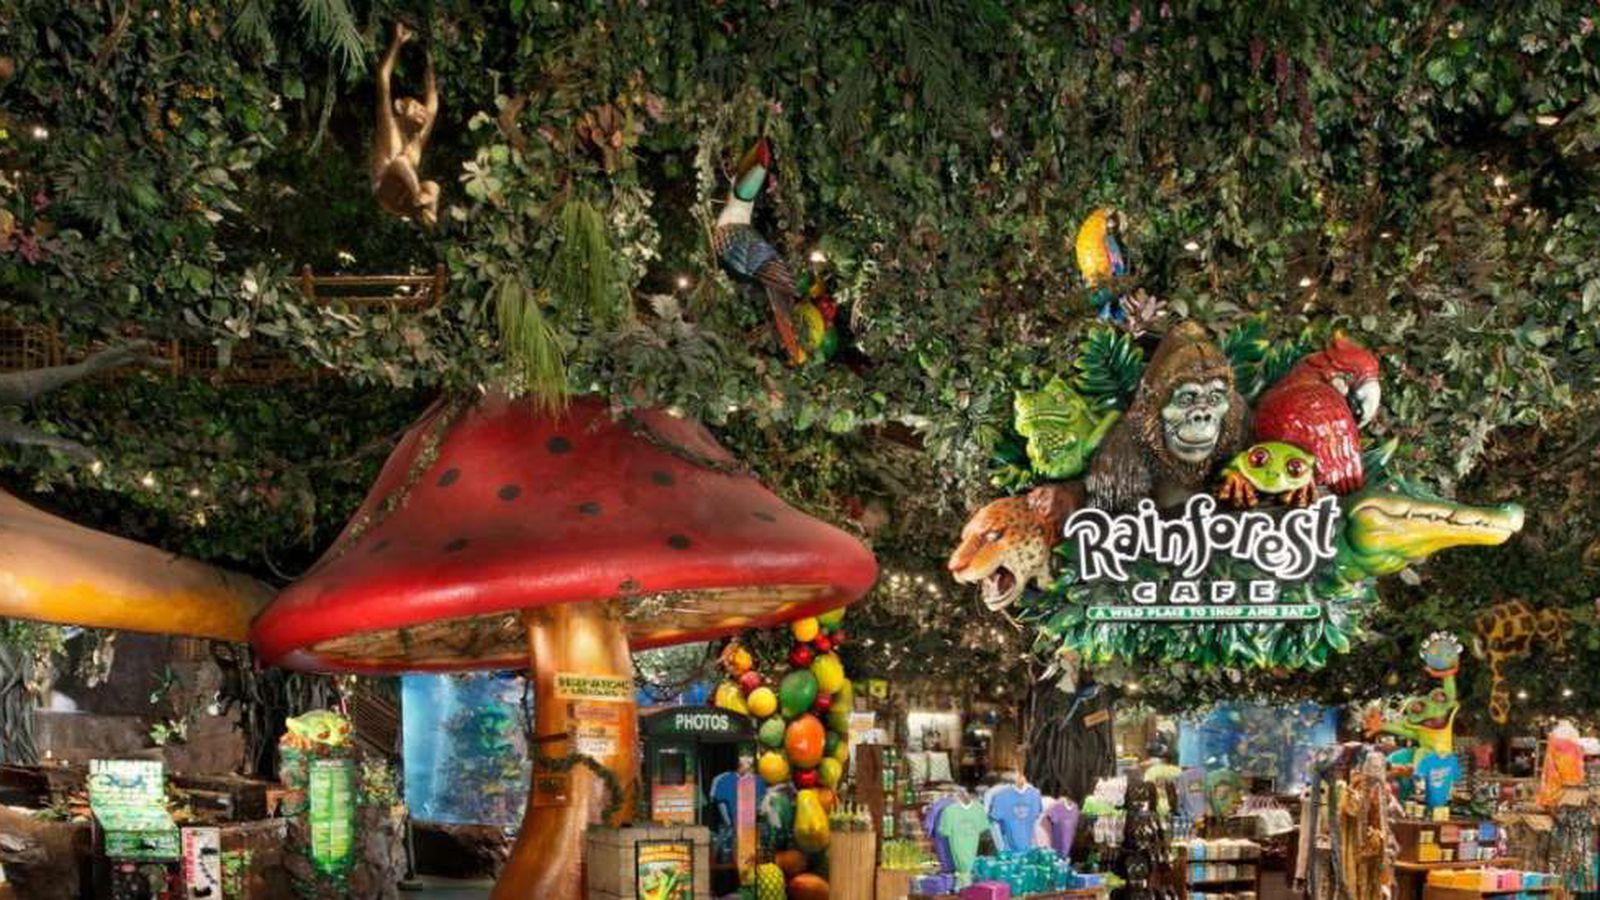 Rainforest Cafe Menu In Nashville Tn